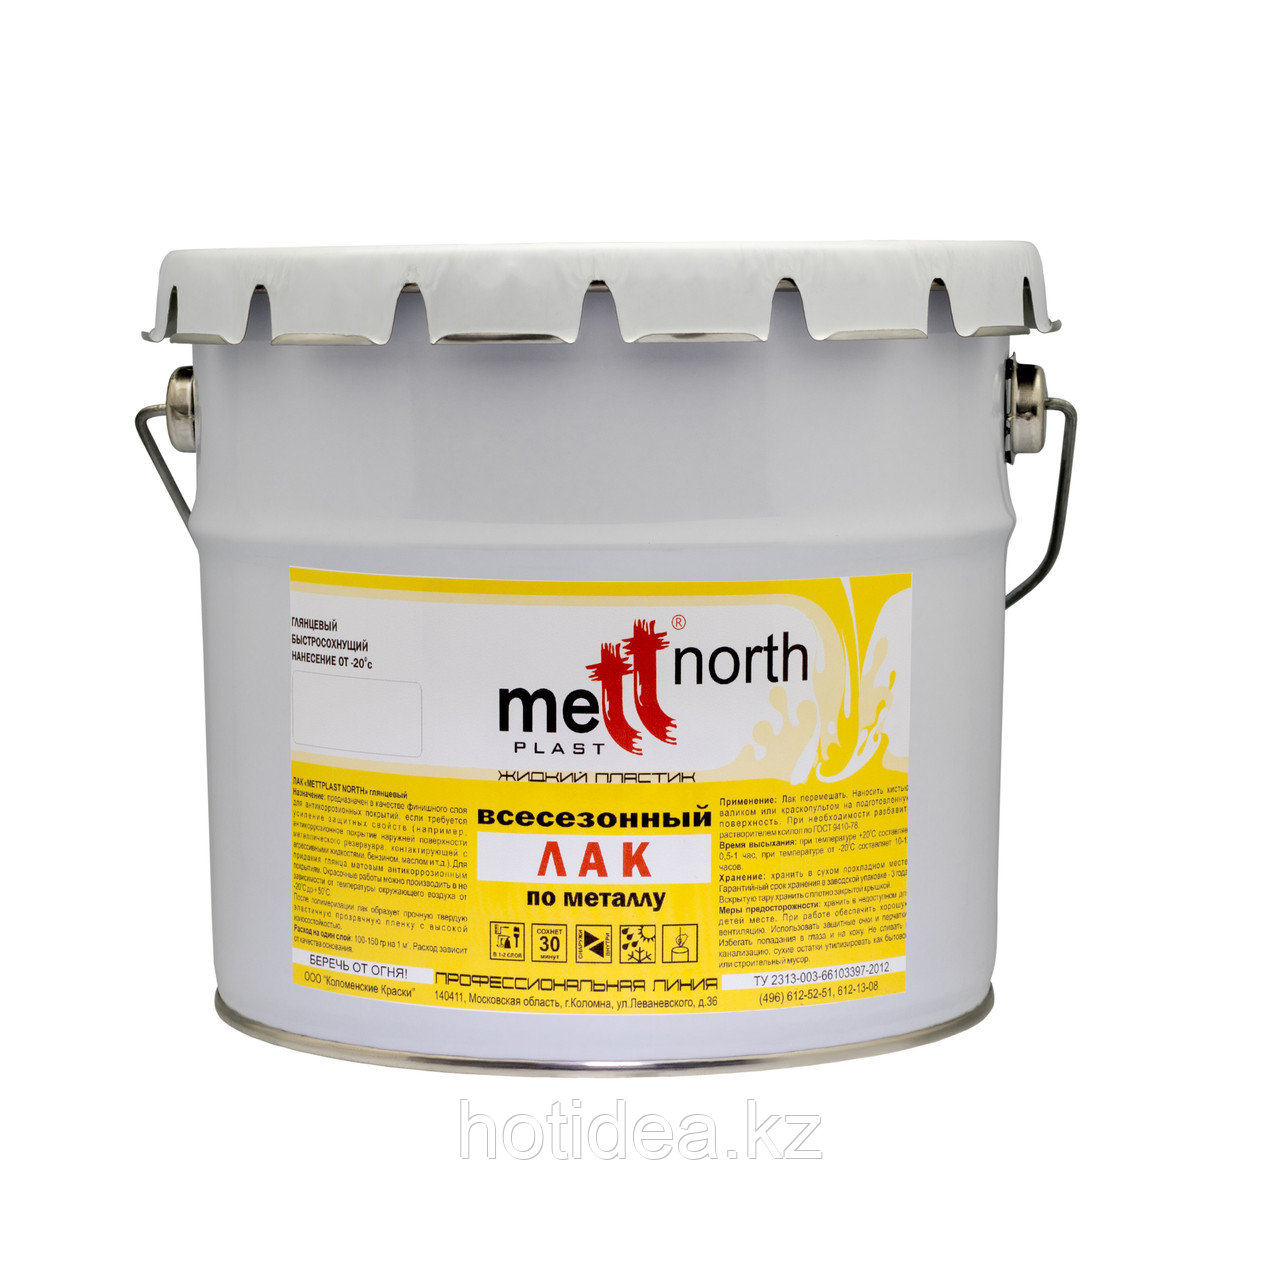 Mettplast North Лак